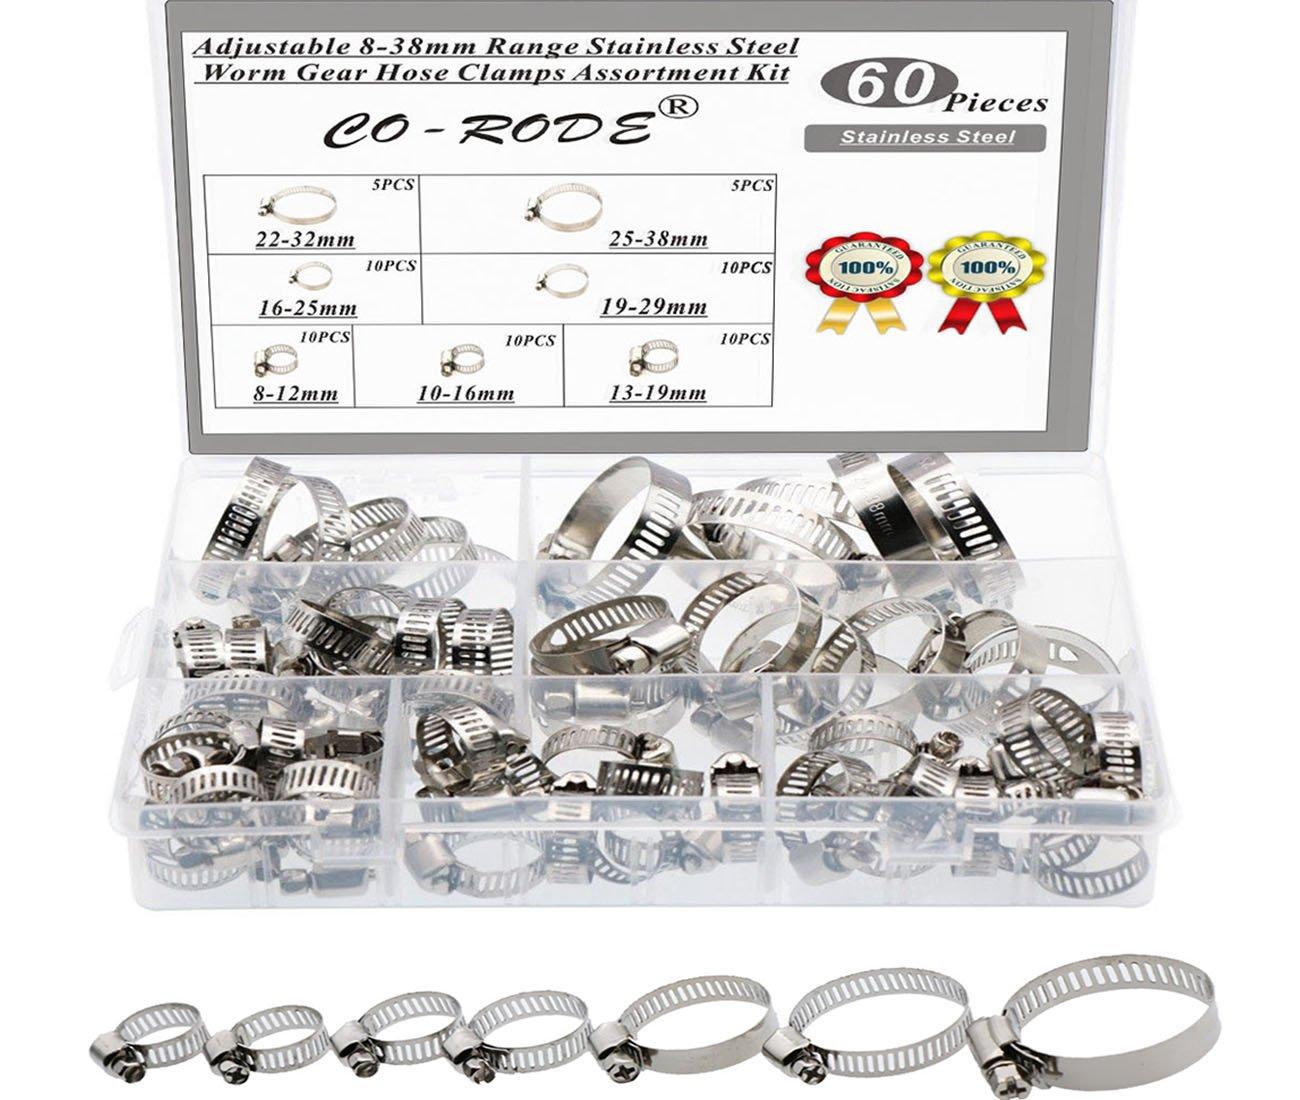 60PCS 8-38mm Range Adjustable Stainless Steel Worm Gear Hose Clamps Screw Assortment Kit